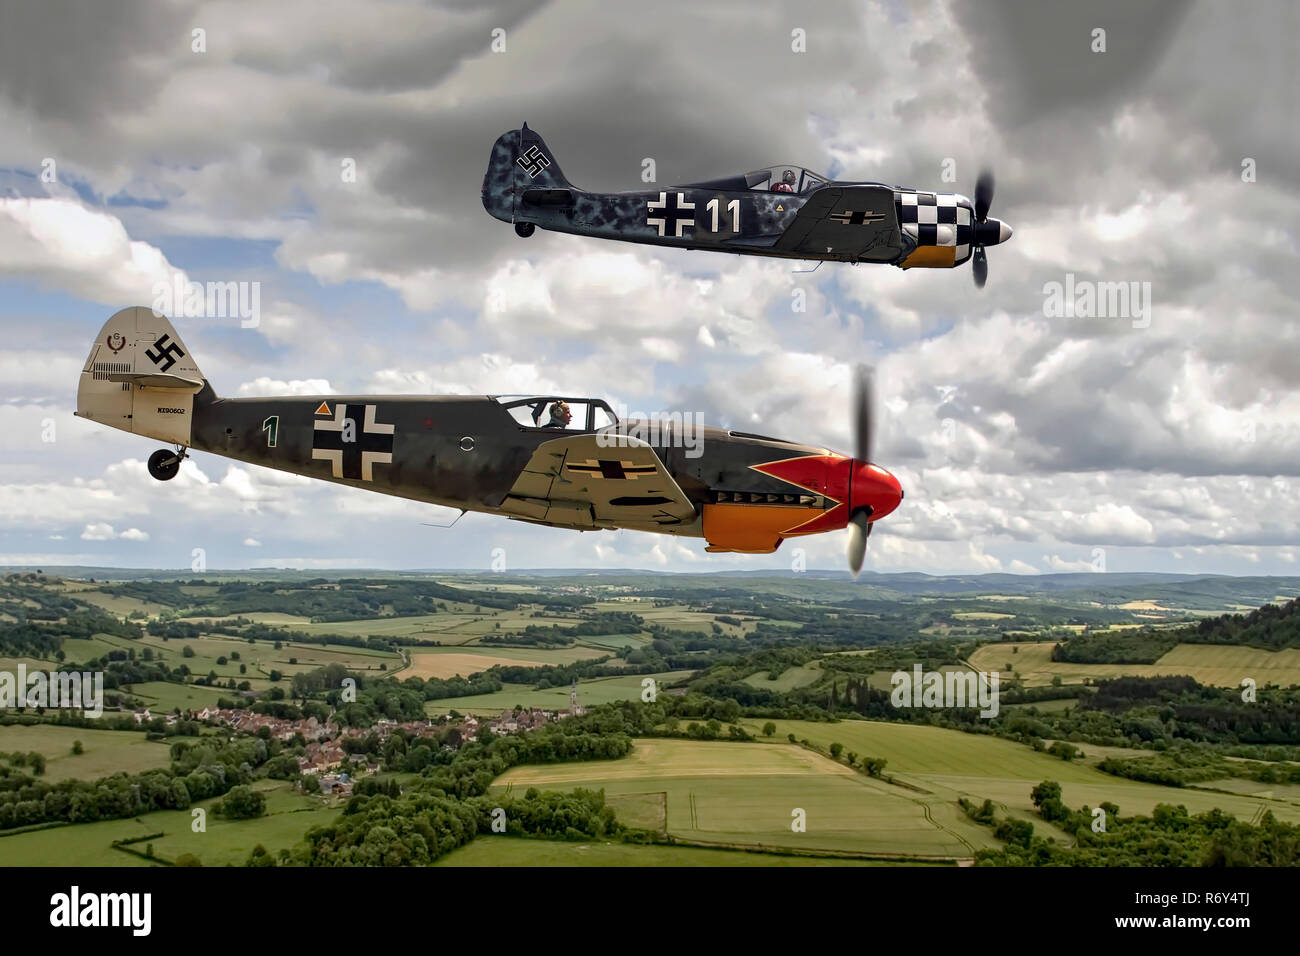 Focke-Wulf FW190 and Messerschmitt Bf 109G over France - Stock Image